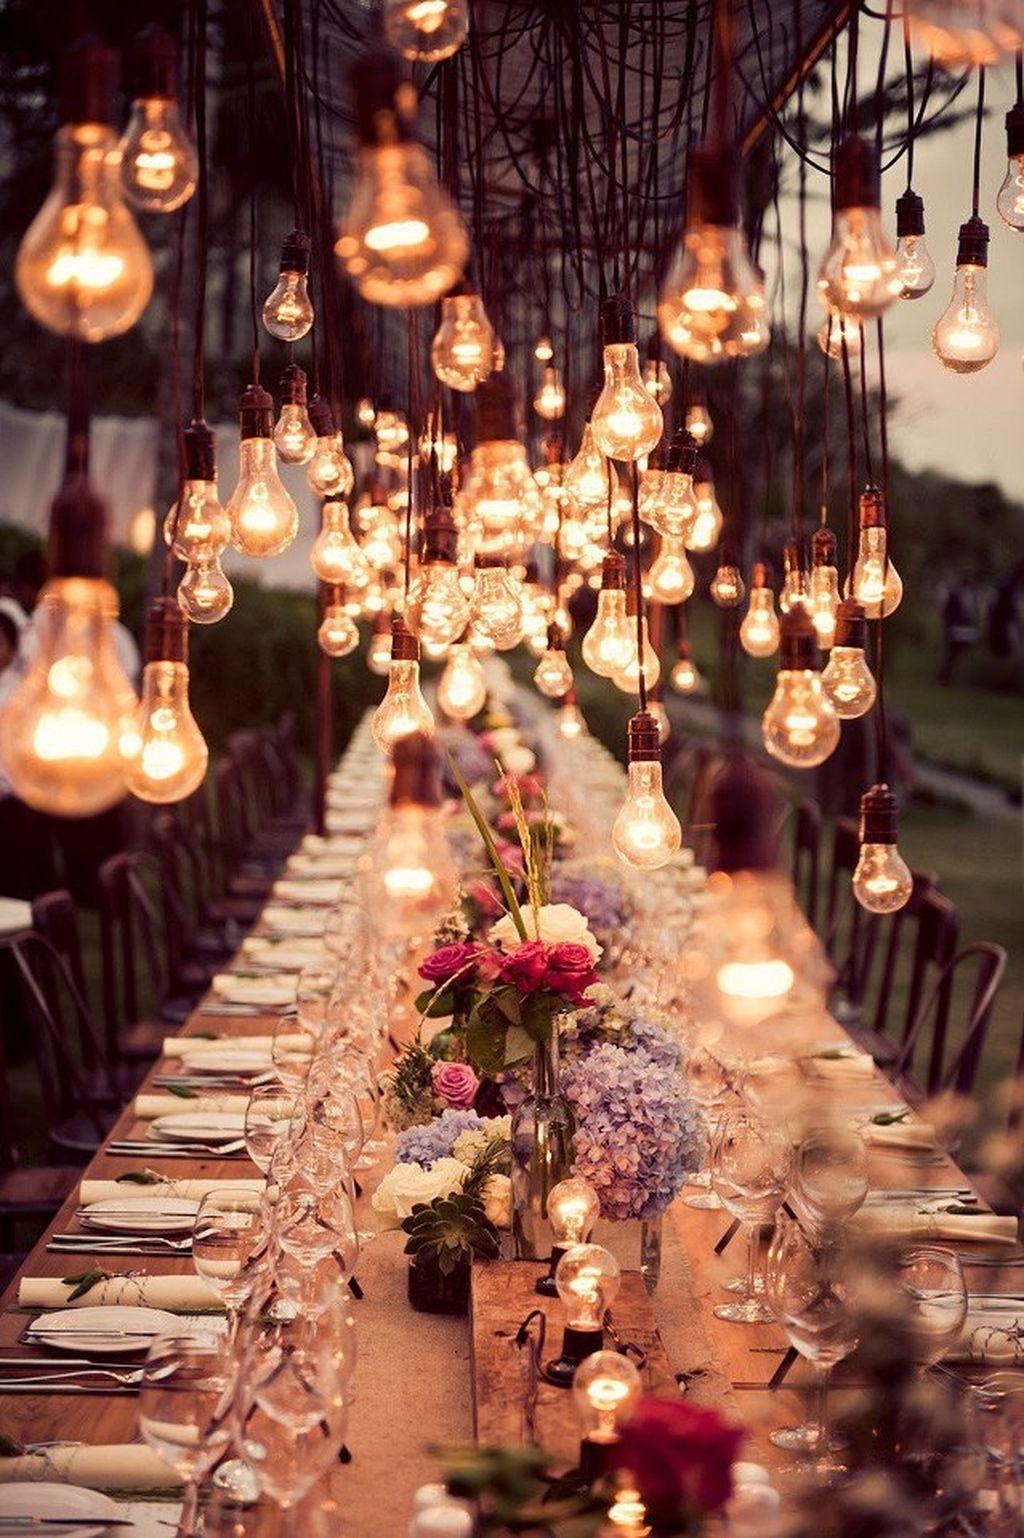 109 cheap but elegant outdoor wedding centerpieces ideas wedding 109 cheap but elegant outdoor wedding centerpieces ideas arubaitofo Image collections